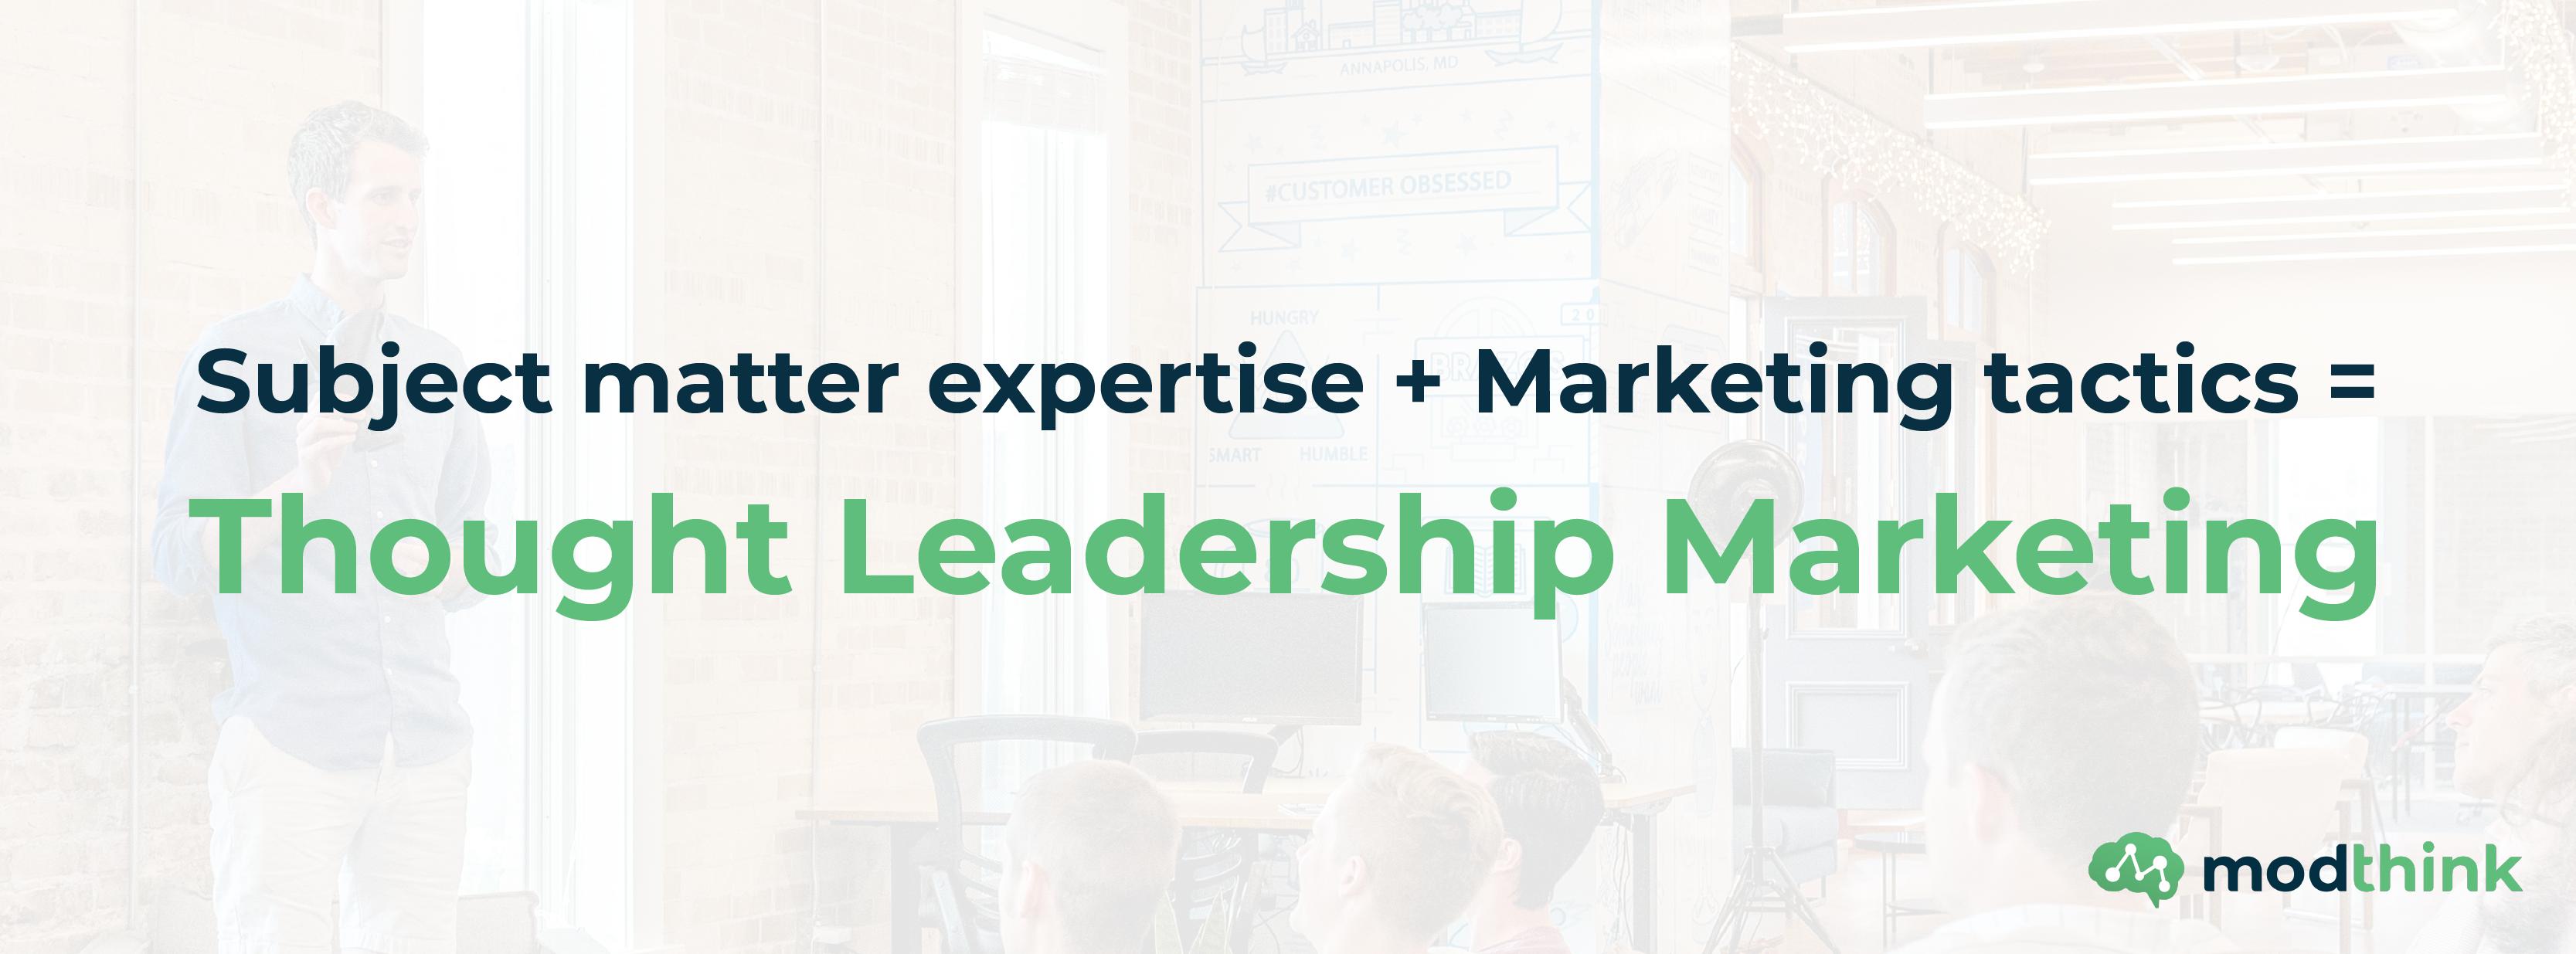 Subject Matter Expertise + Marketing Tactics = Thought Leadership Marketing